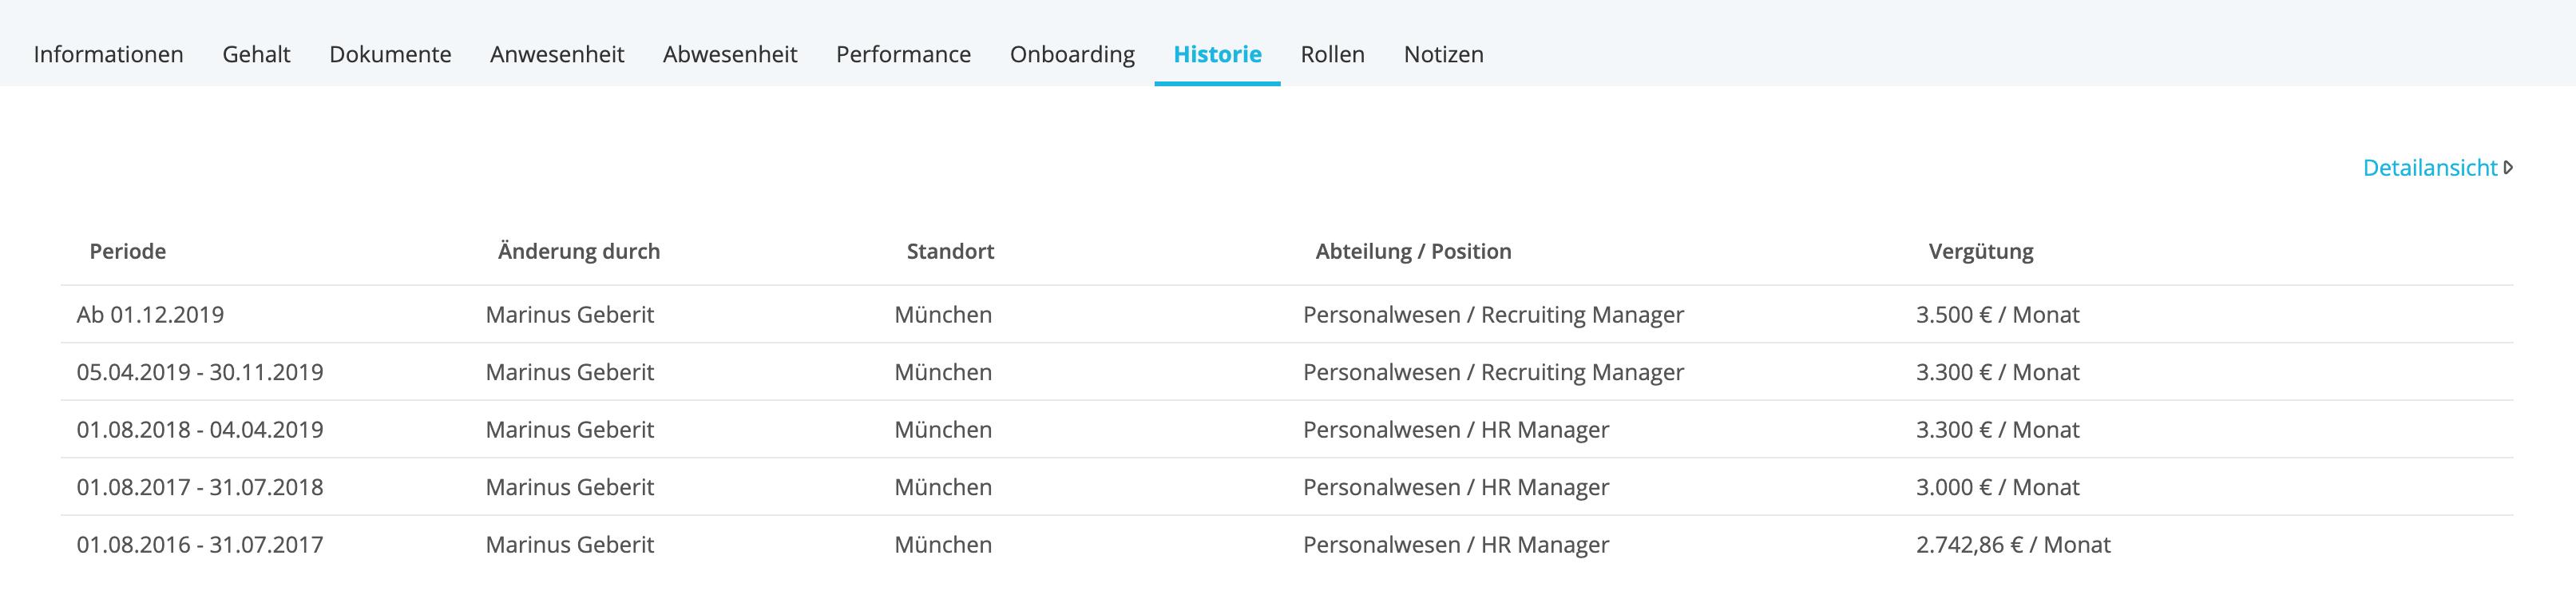 employee-history-1_de.png